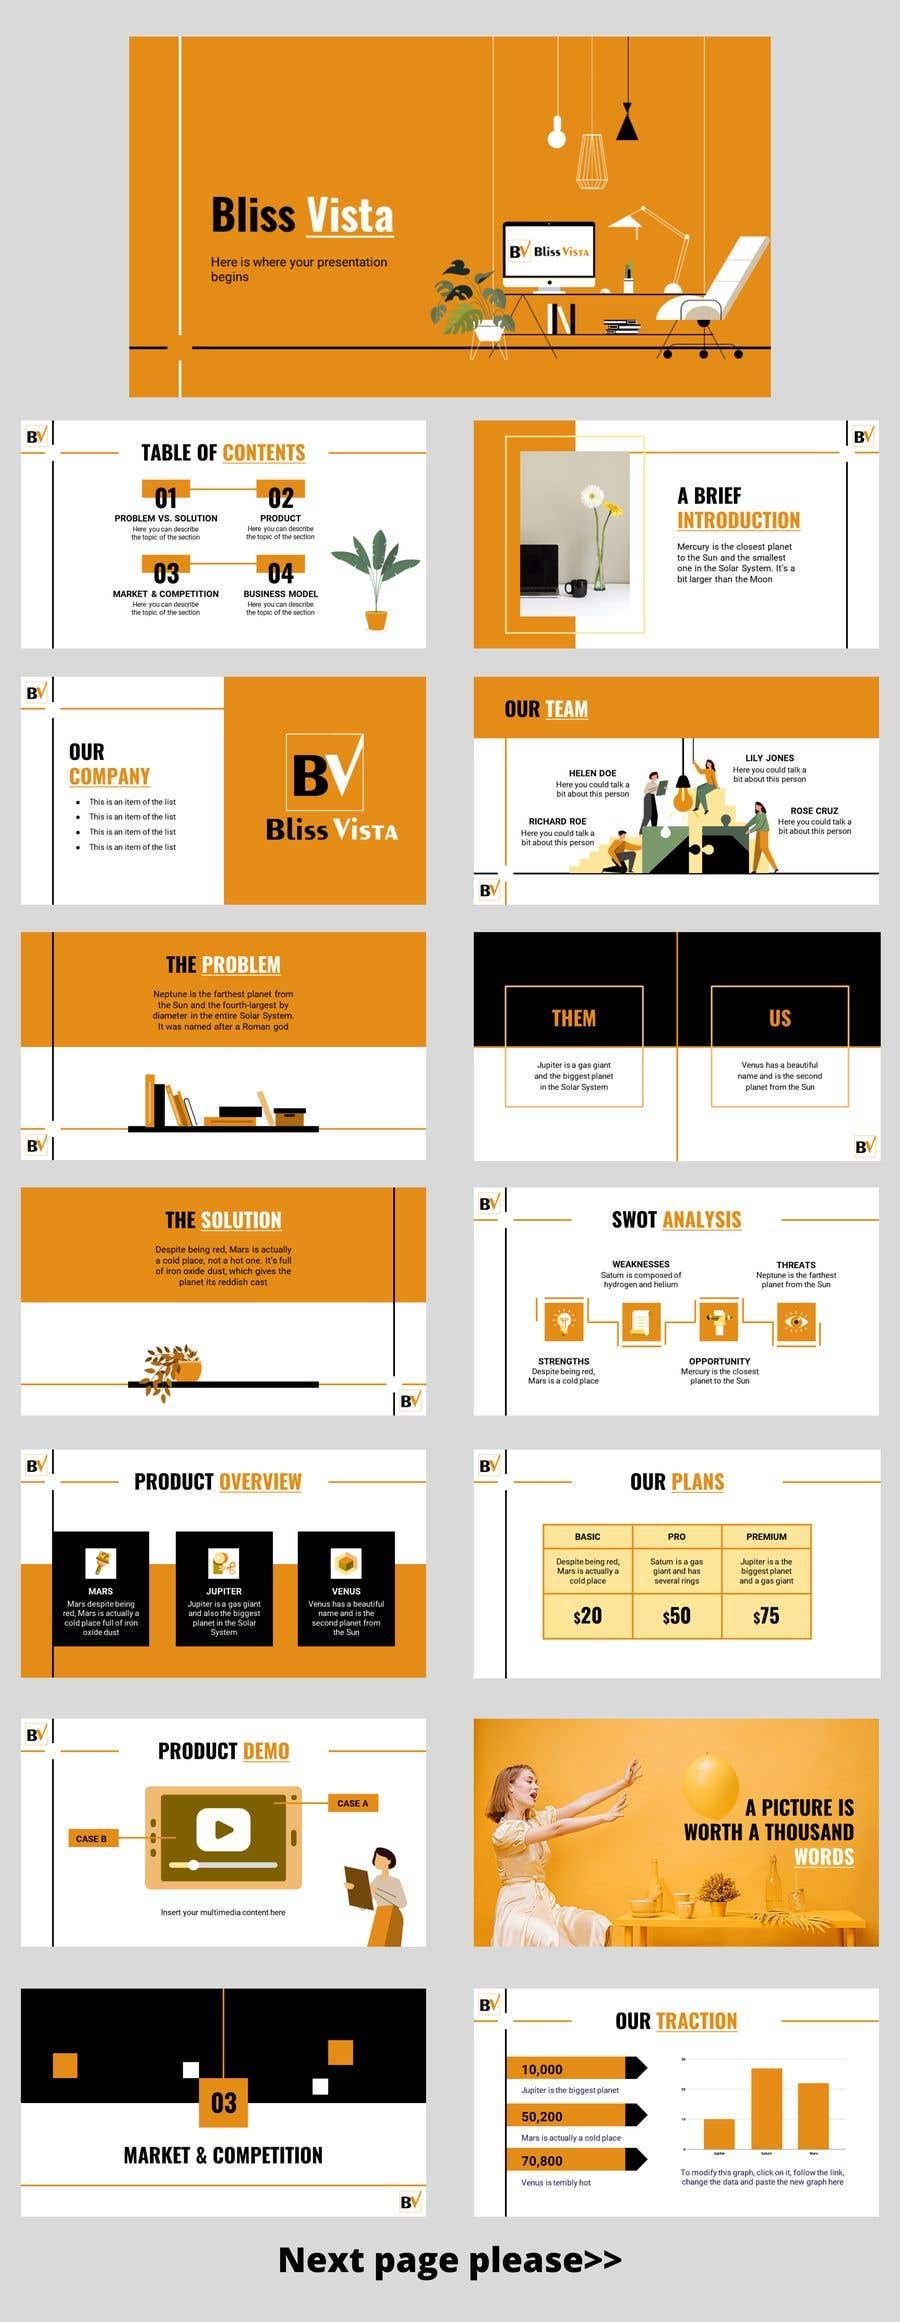 Penyertaan Peraduan #                                        31                                      untuk                                         Design a Custom PowerPoint Template